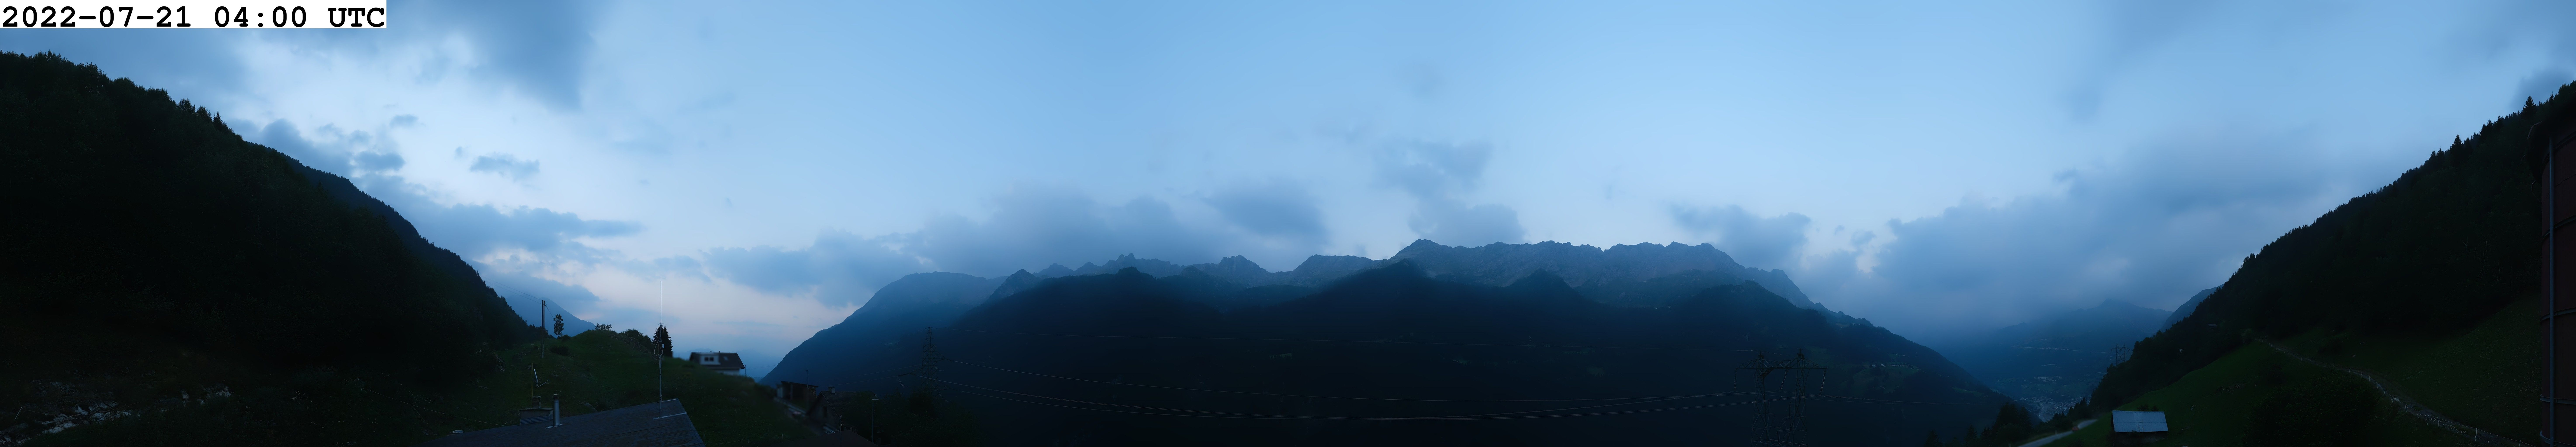 Monte di Vento: Brugnasco